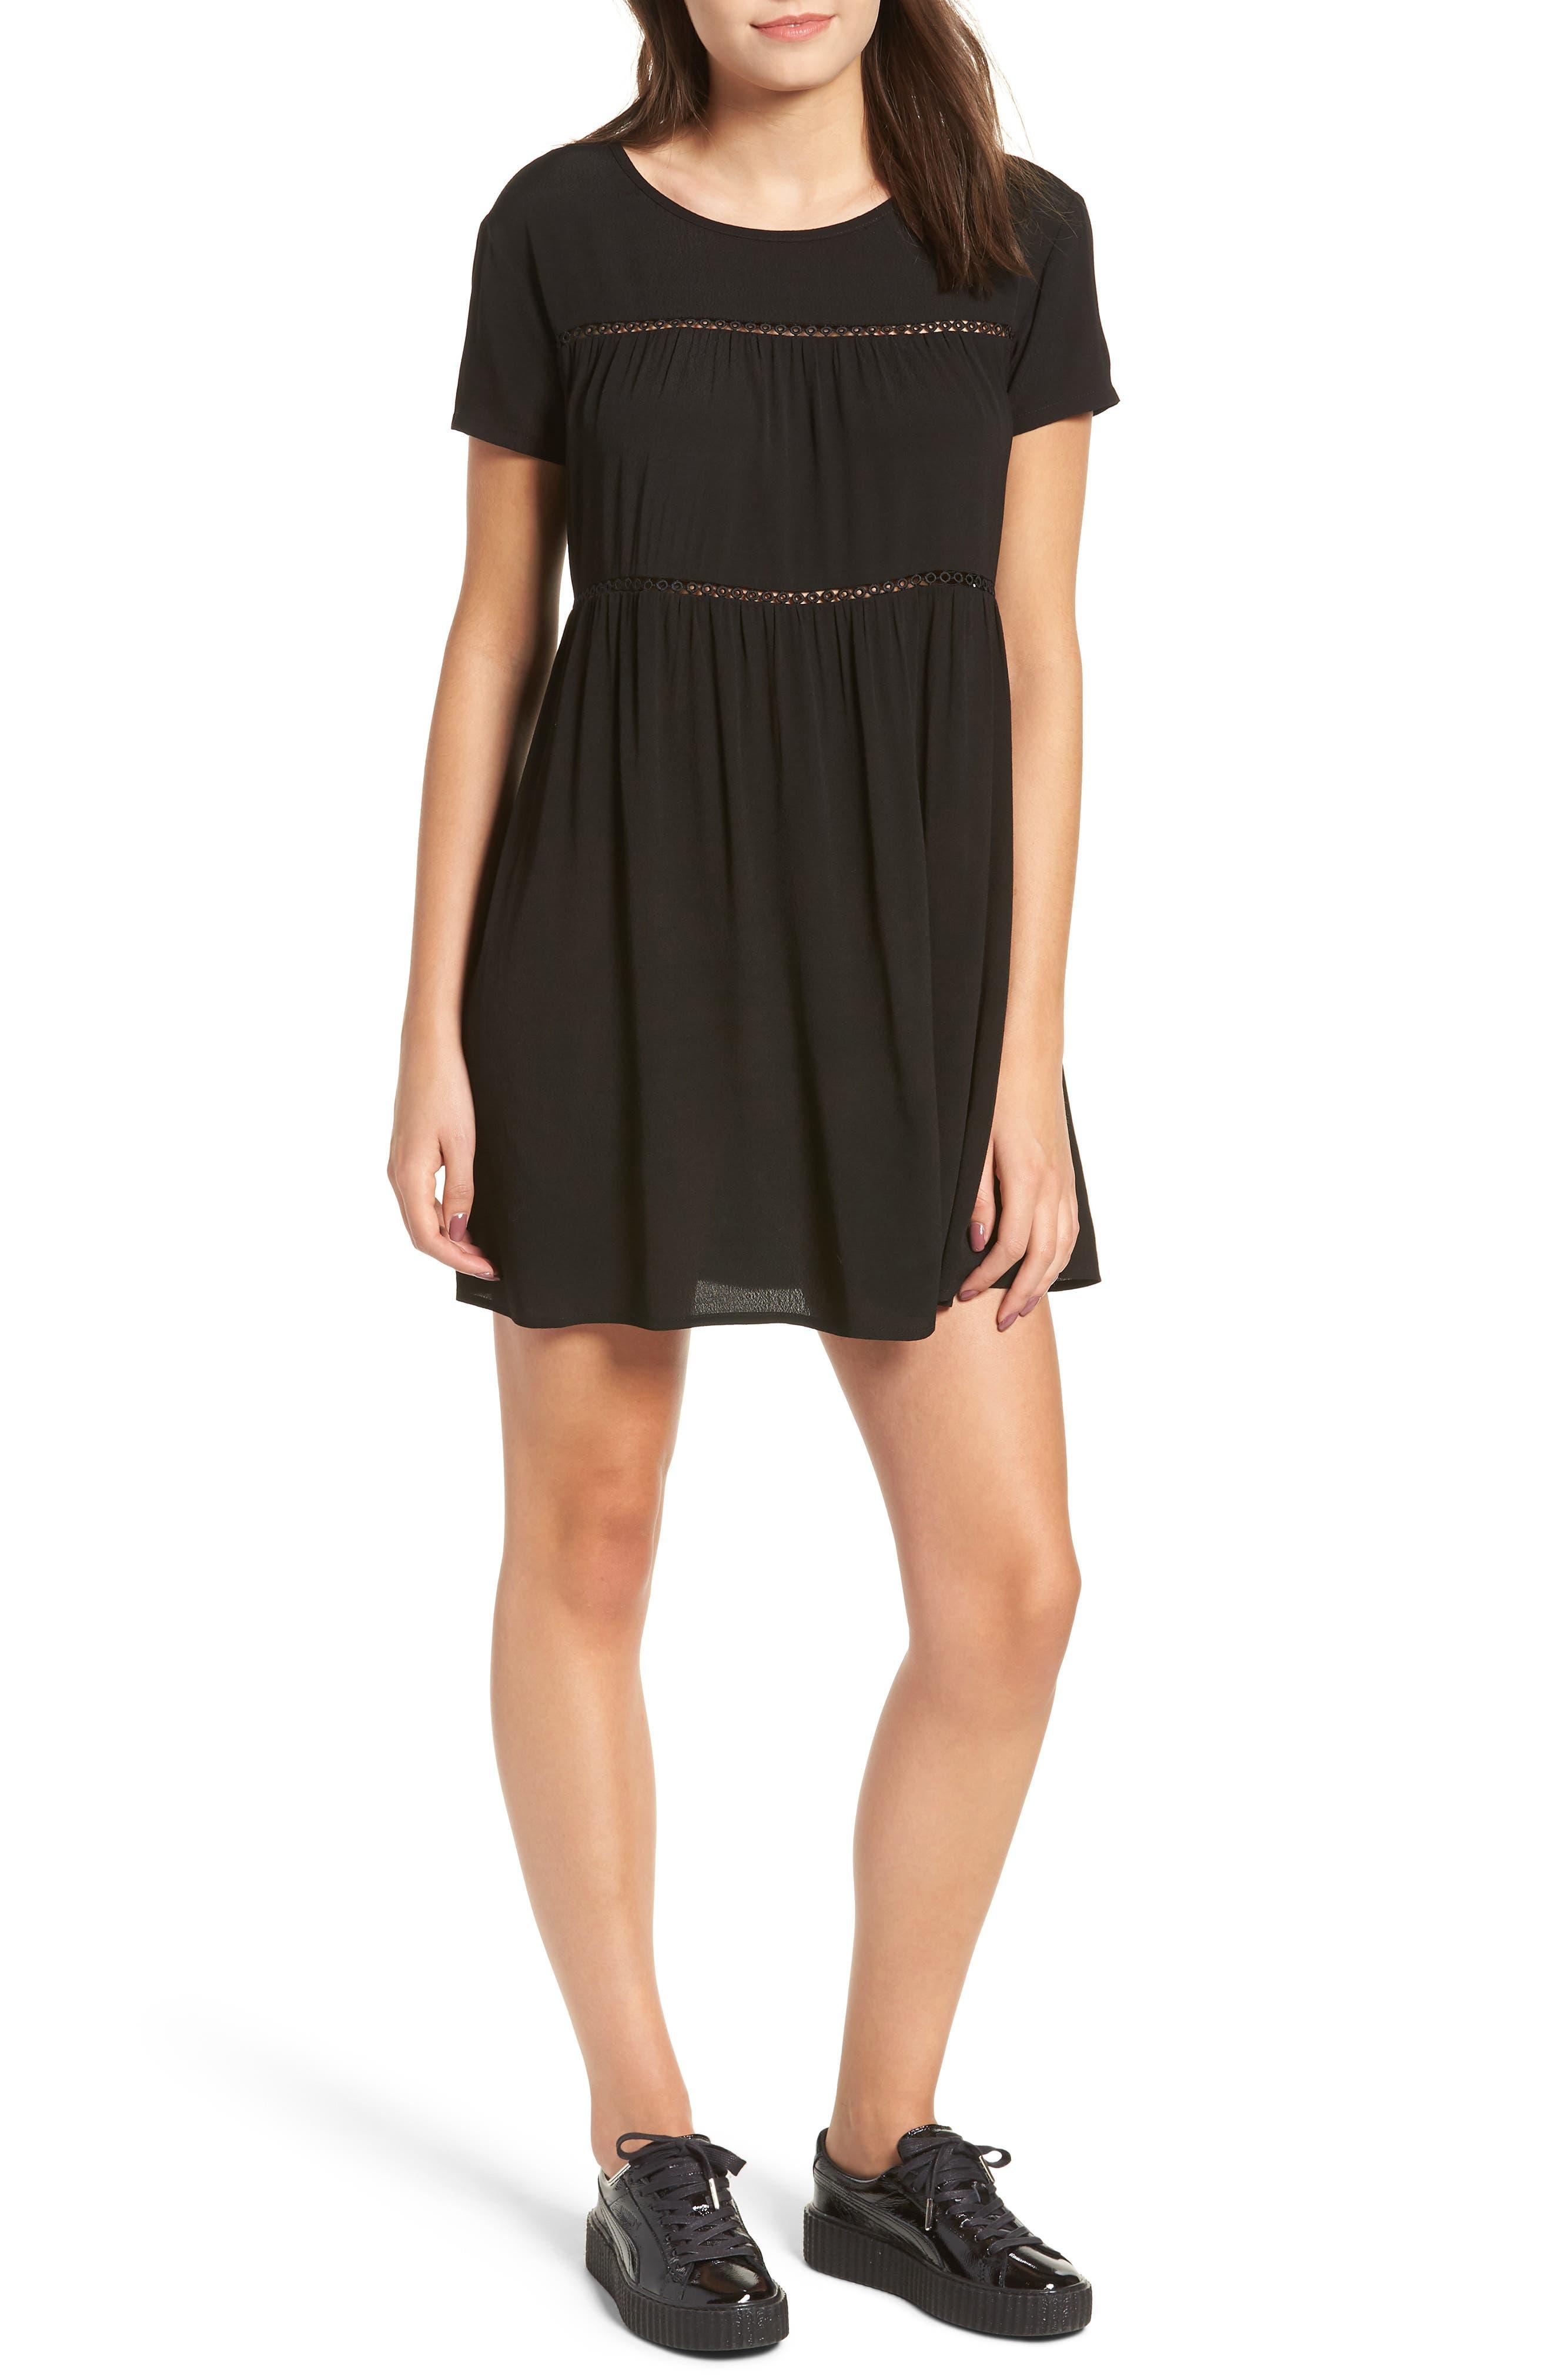 LIRA CLOTHING Amelia Silk Blend Babydoll Dress, Main, color, BLACK